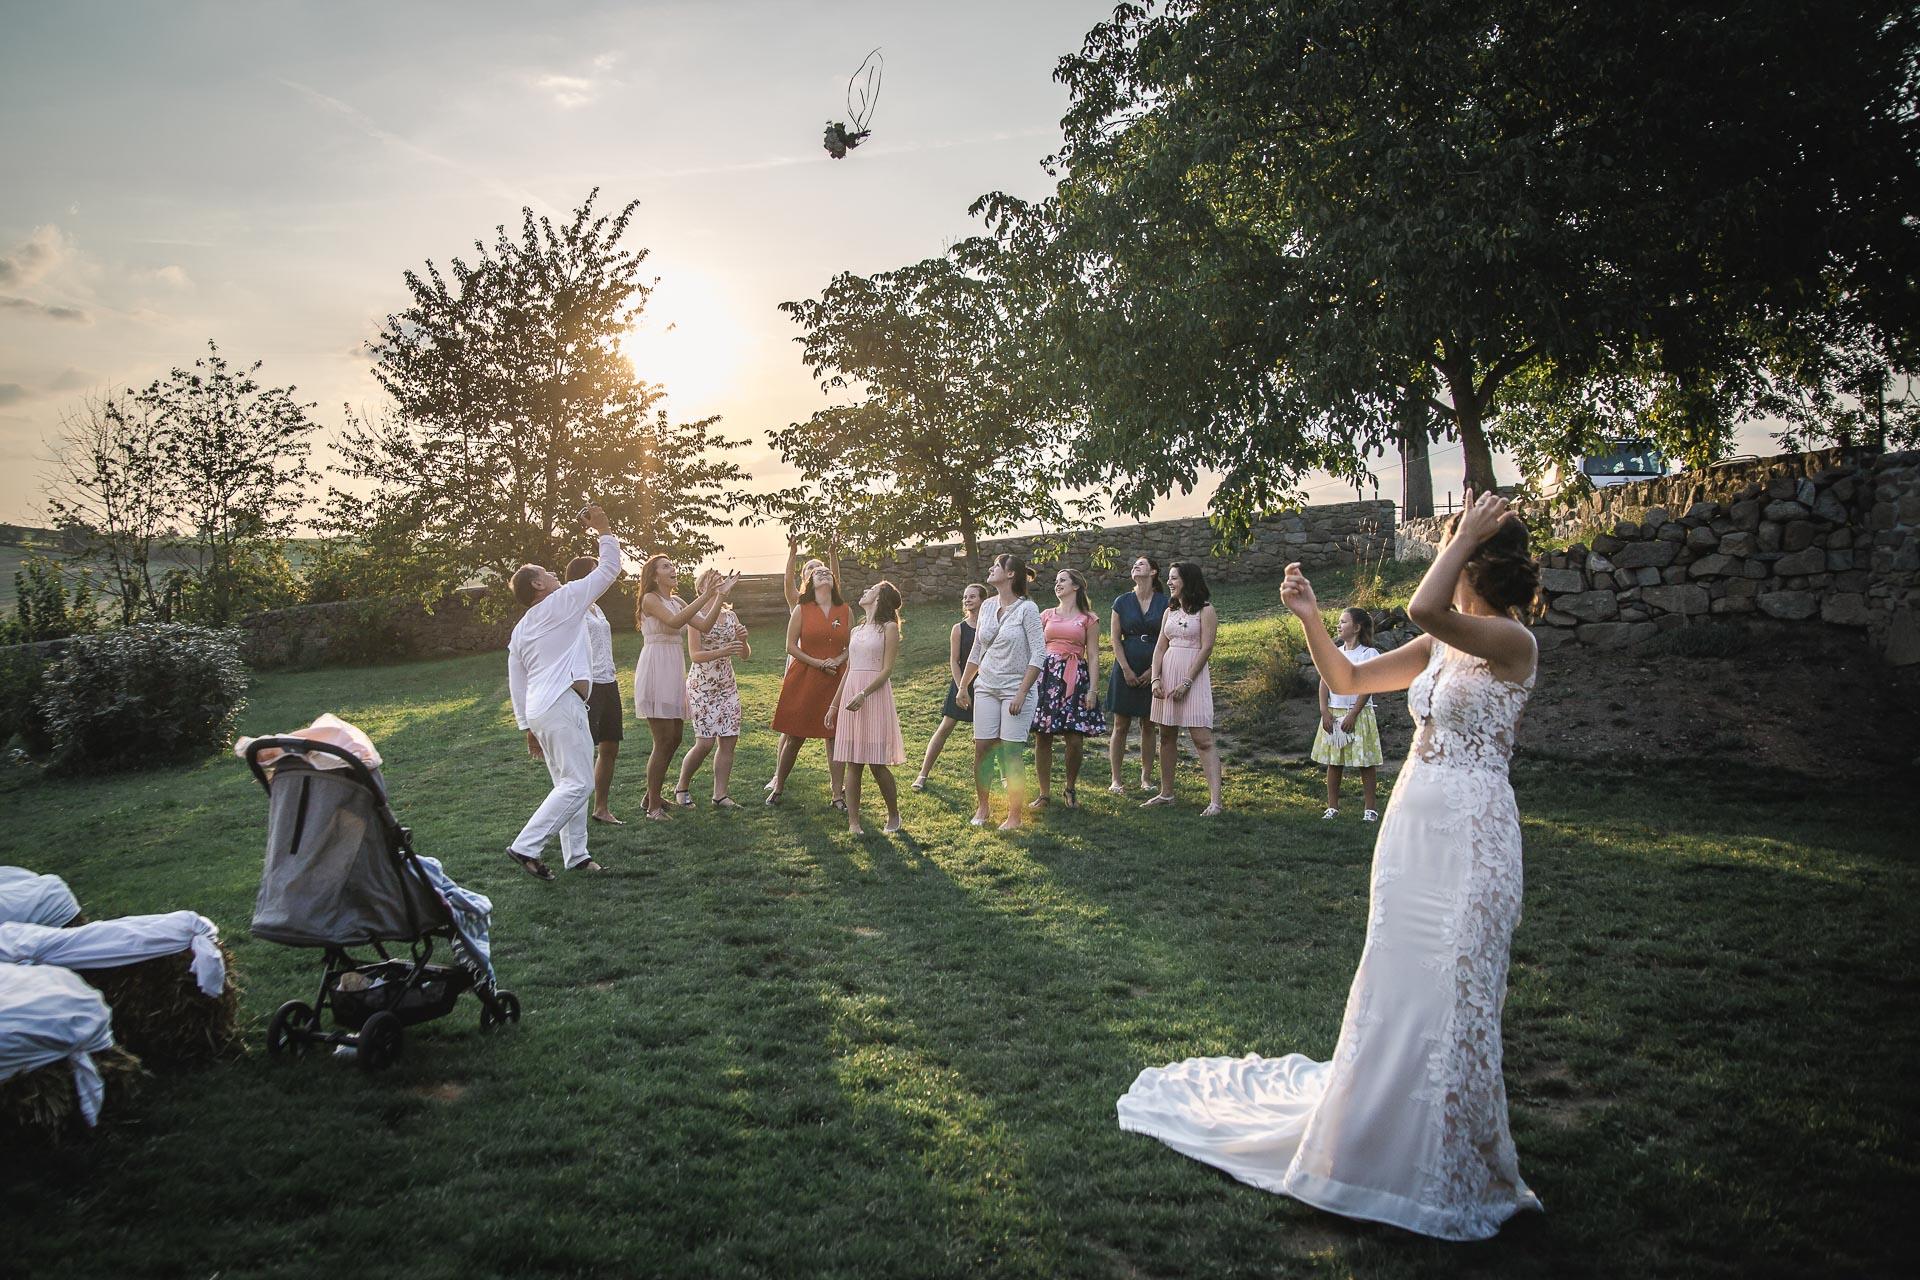 svatební-fotograf-wedding-svatebni-video-orlík-vltava-kostel-statek-stodola-boho-svatba-Beautyfoto-566